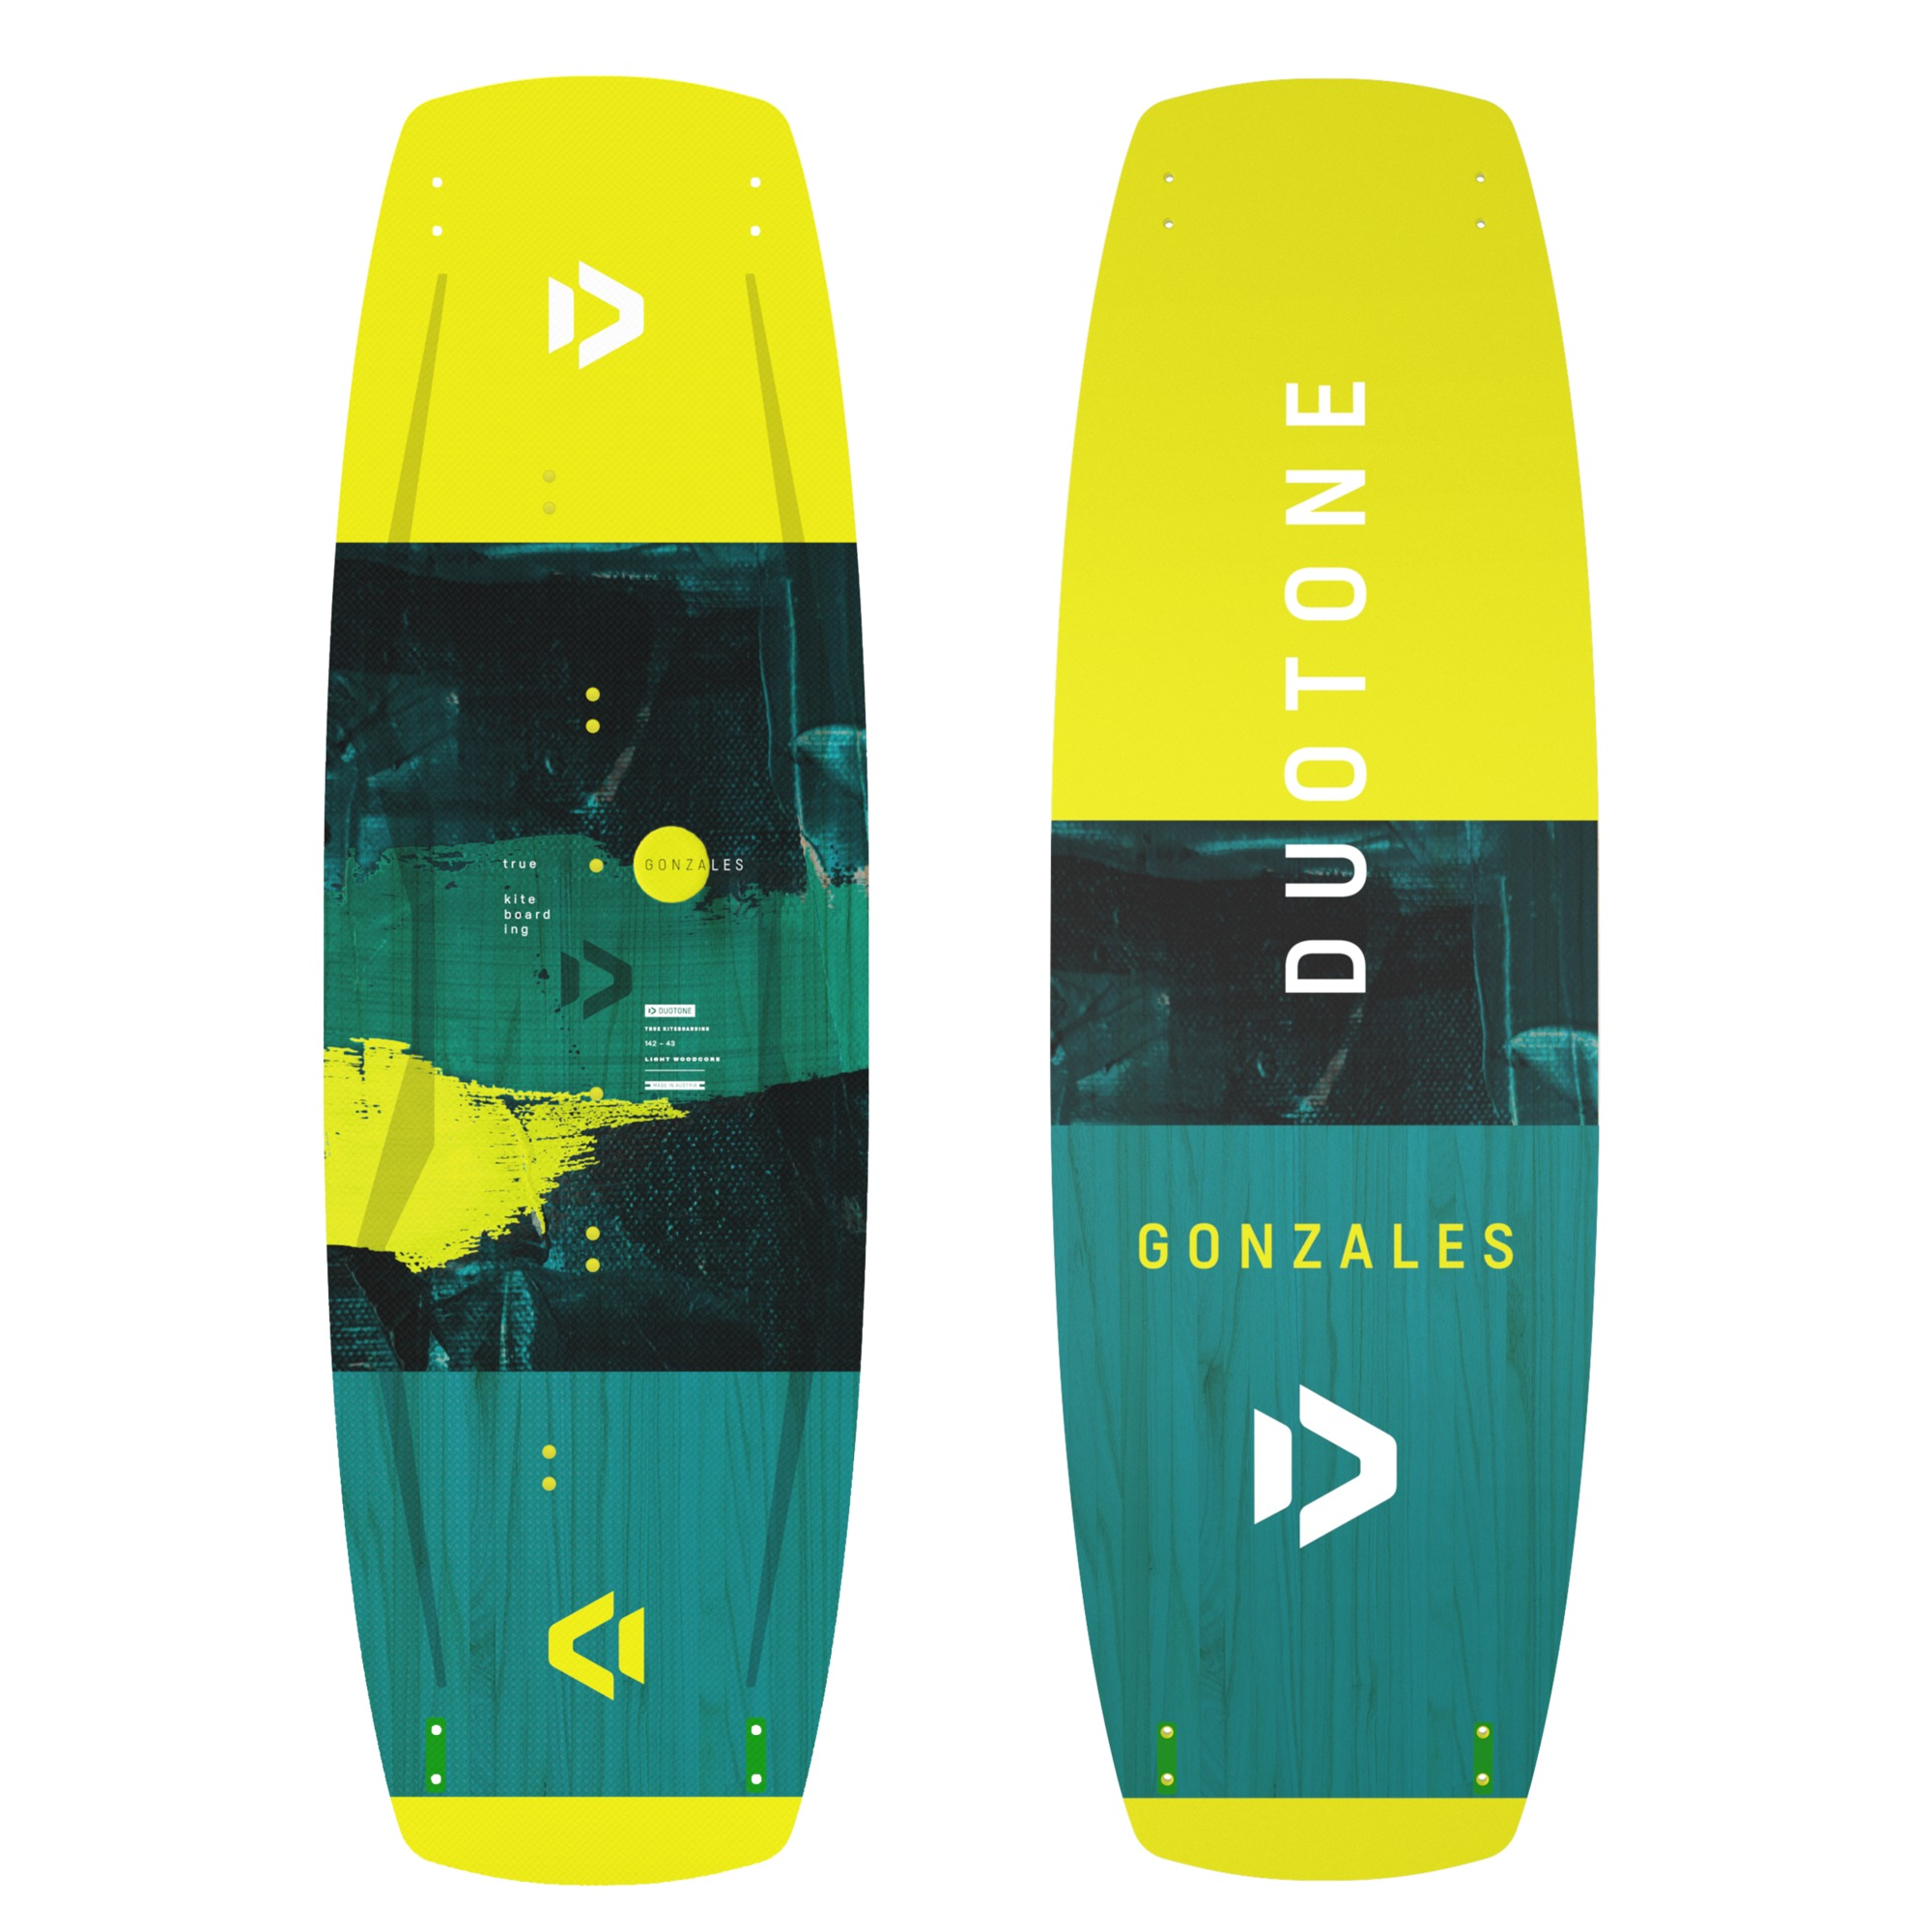 Duotone Gonzales 2020 Kiteboarding Kitesurfing equipment